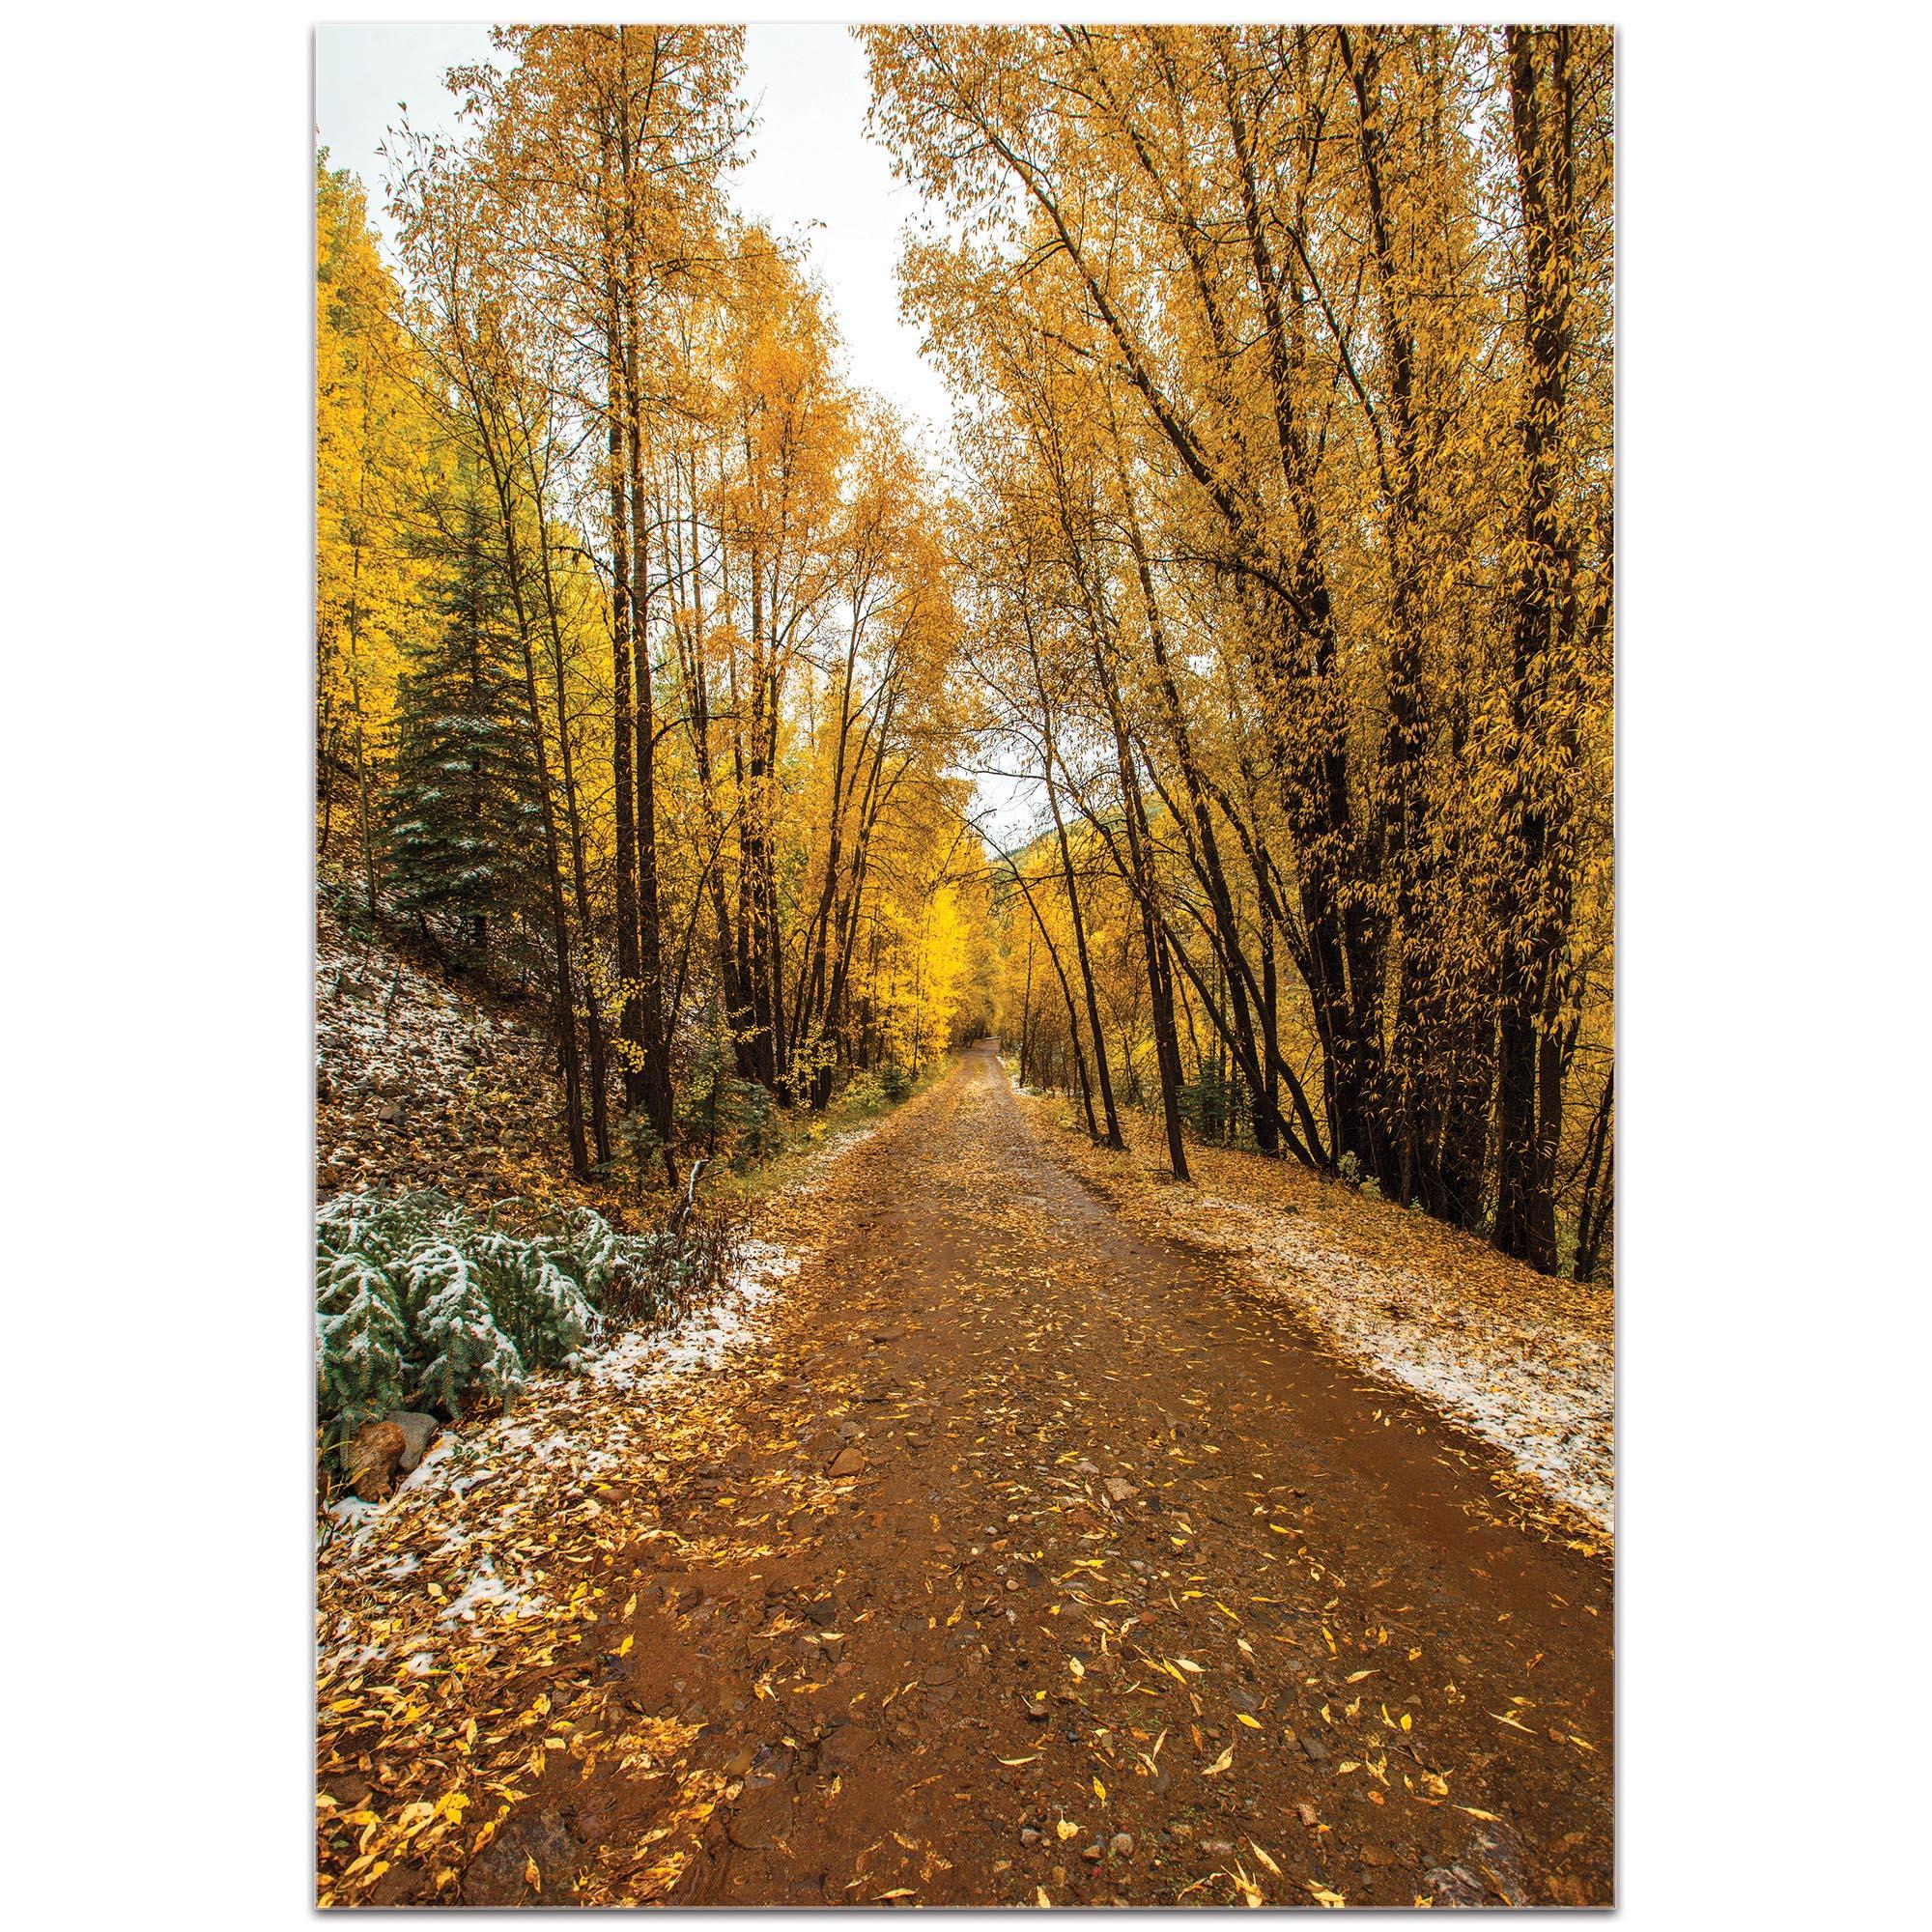 Landscape Photography 'Mountain Pass' - Autumn Trees Art on Metal or Plexiglass - Image 2